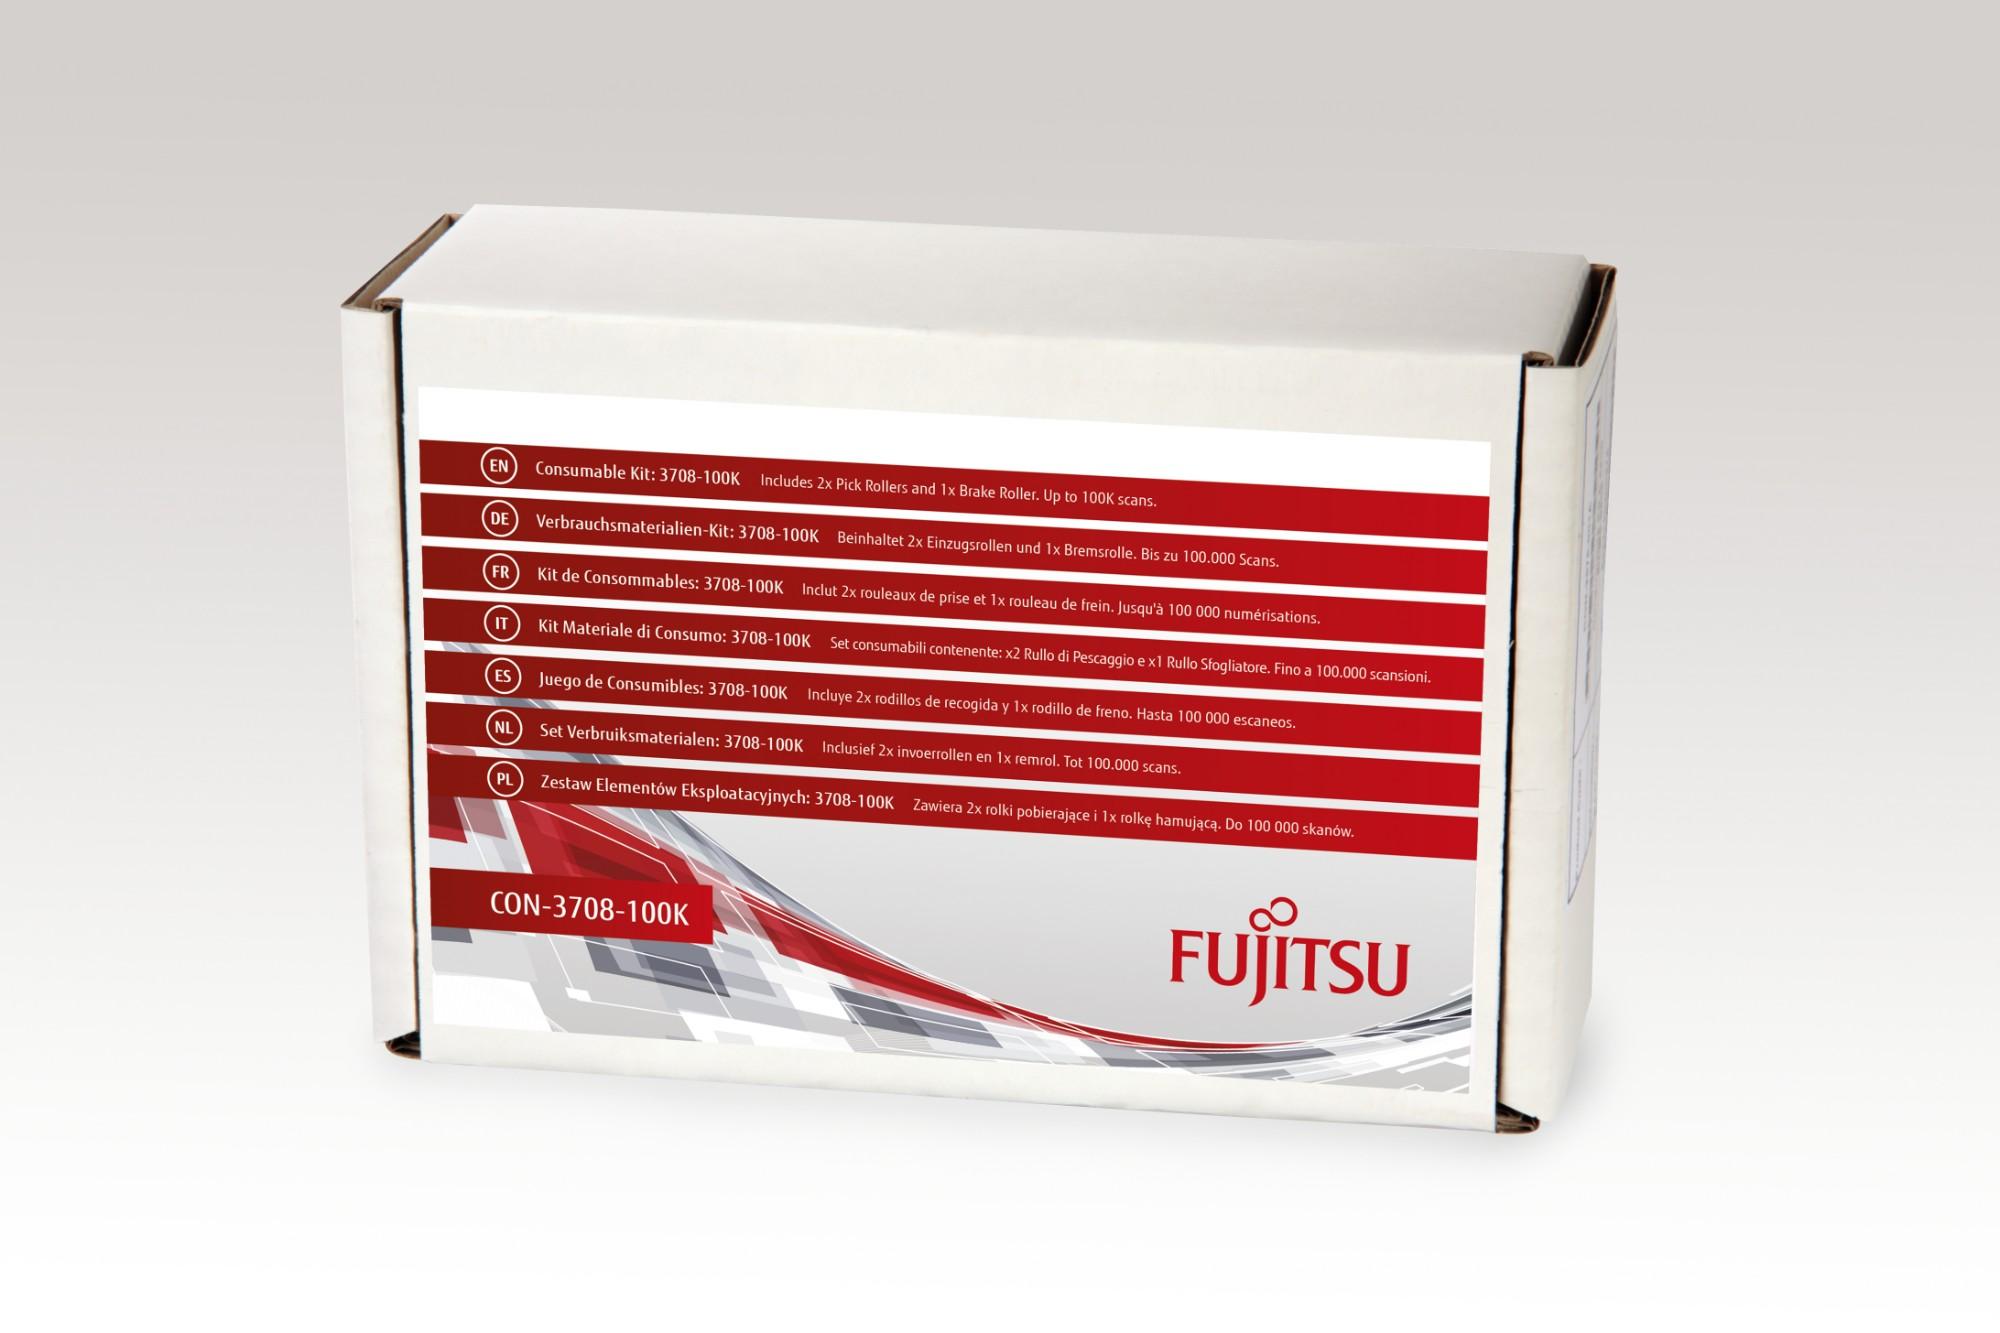 FUJITSU 3708-100K CONSUMABLE KIT SCANNER